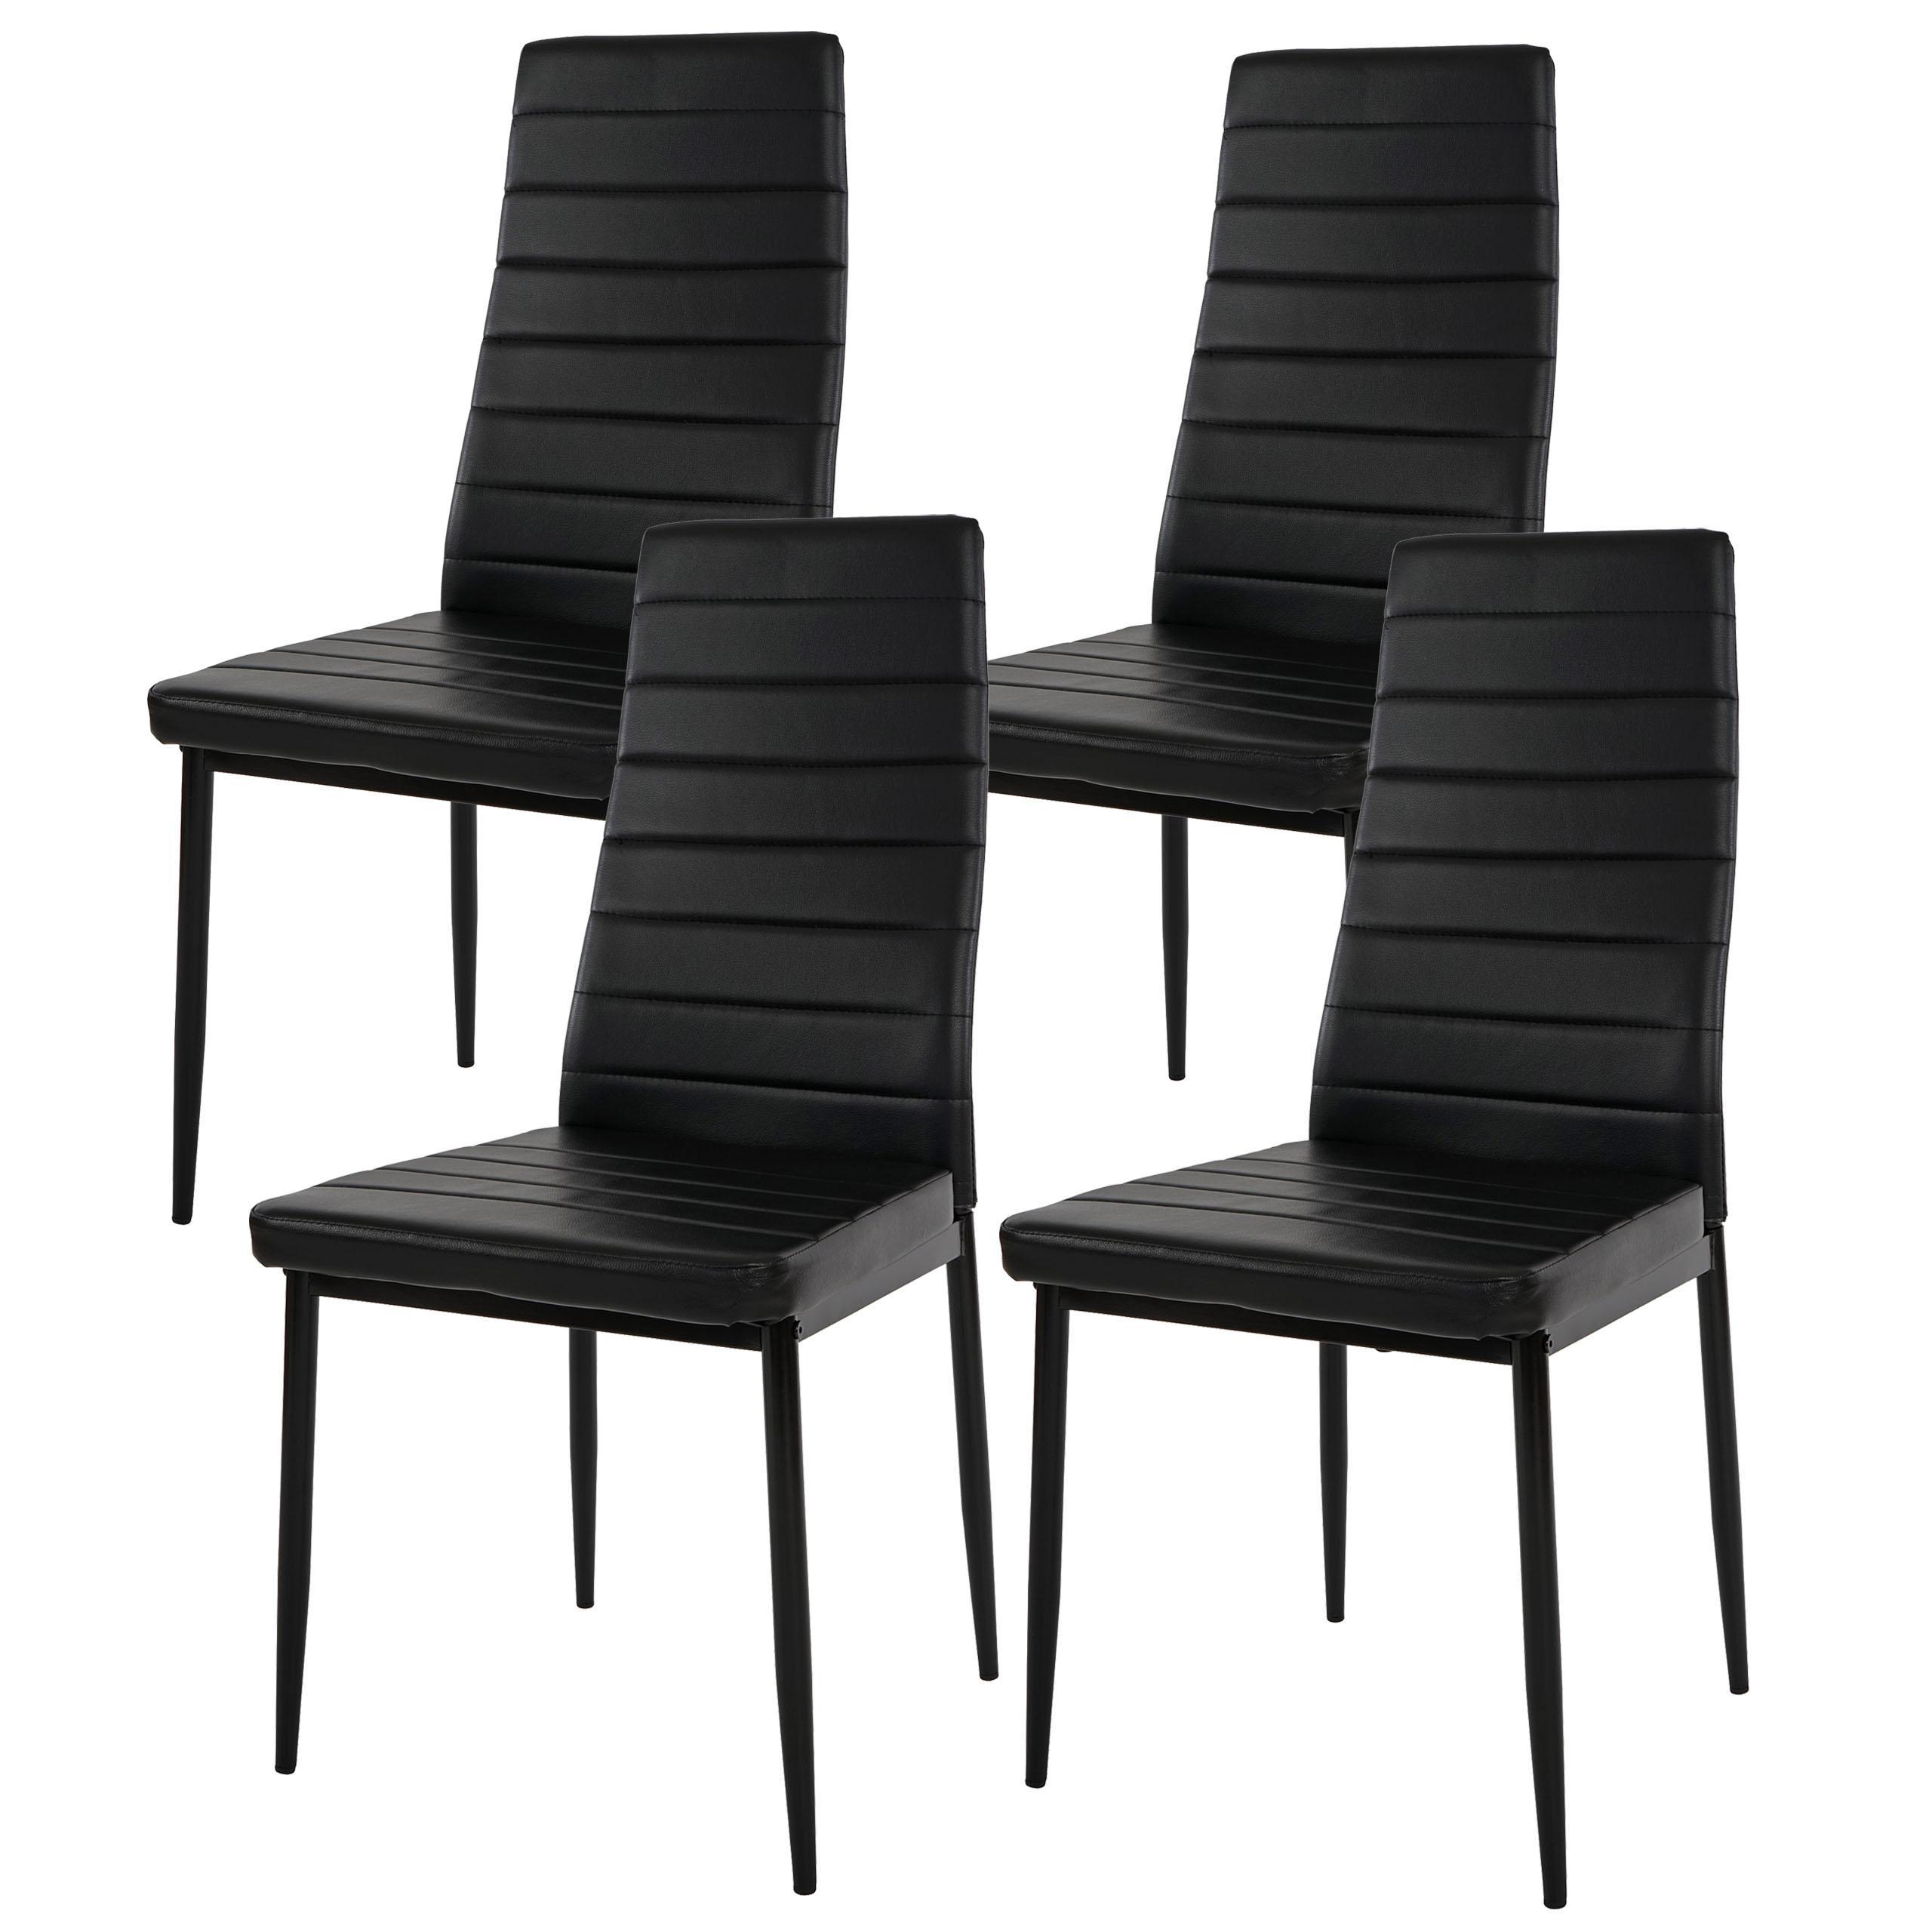 Lote 4 sillas de comedor o cocina kiros gran acolchado for Sillas comedor jardin